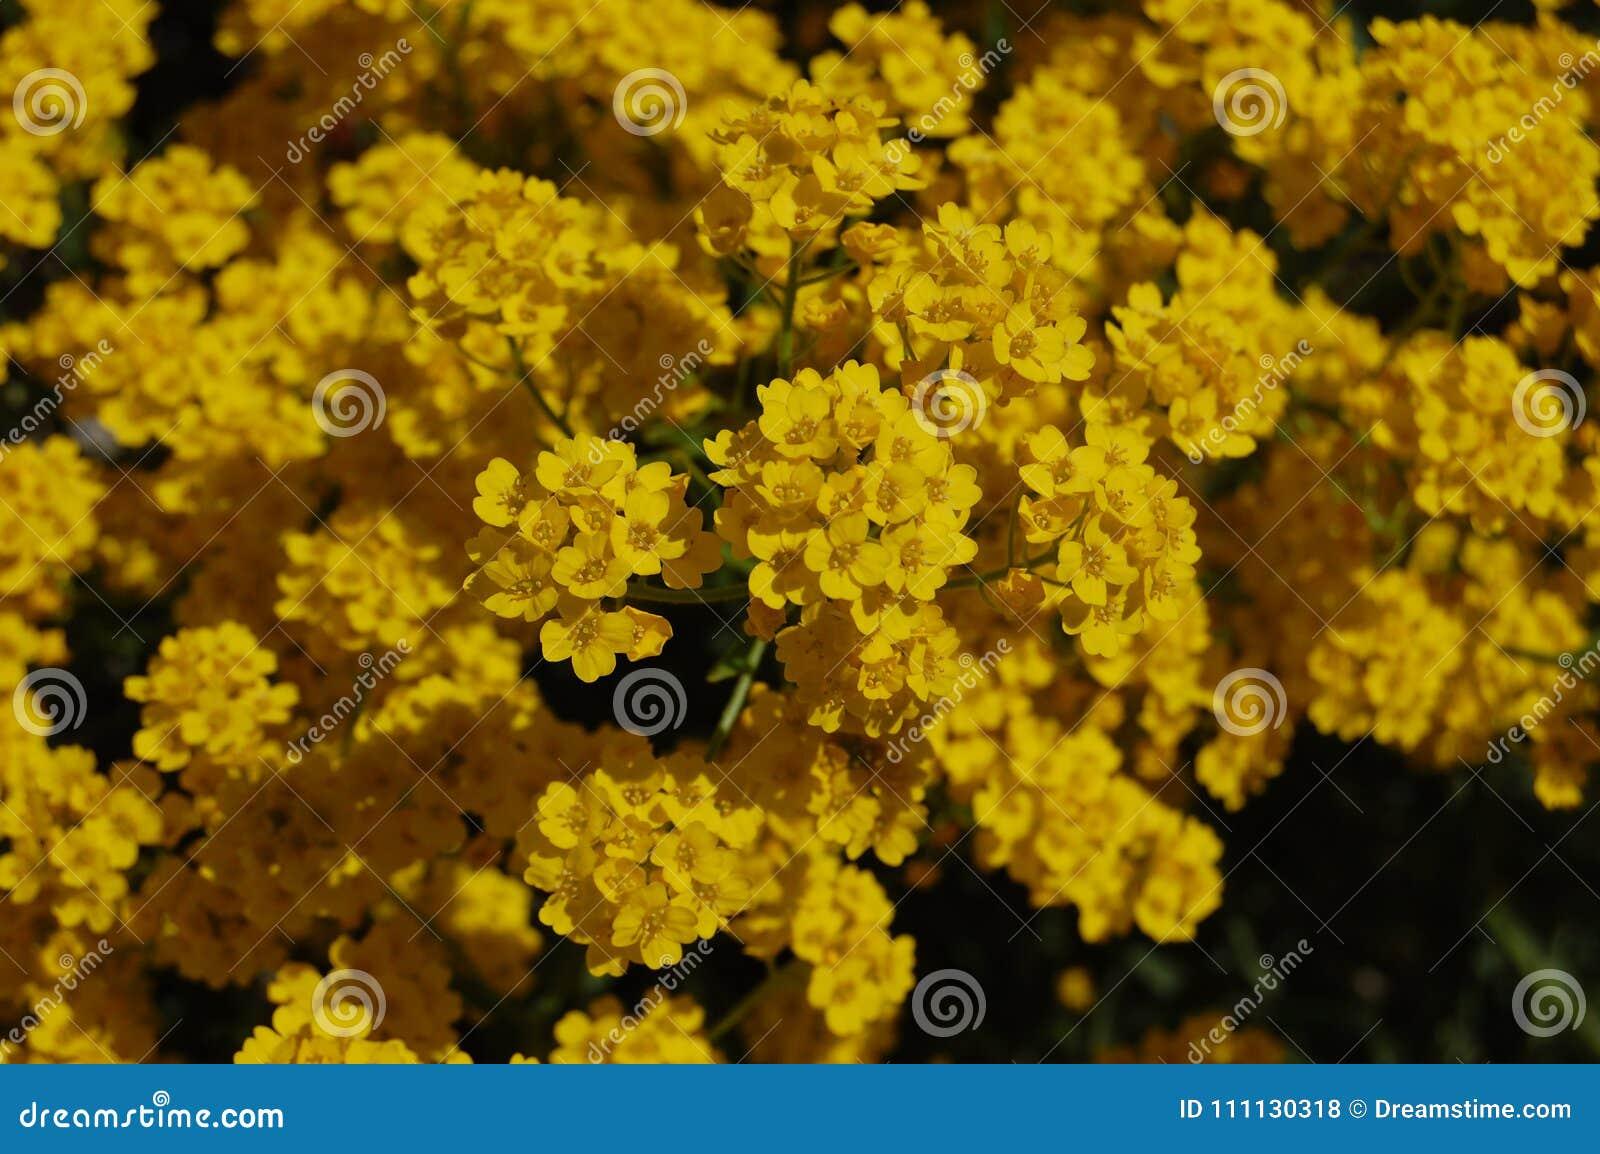 Golden yellow flowers in summer stock photo image of flowers download golden yellow flowers in summer stock photo image of flowers greenery 111130318 mightylinksfo